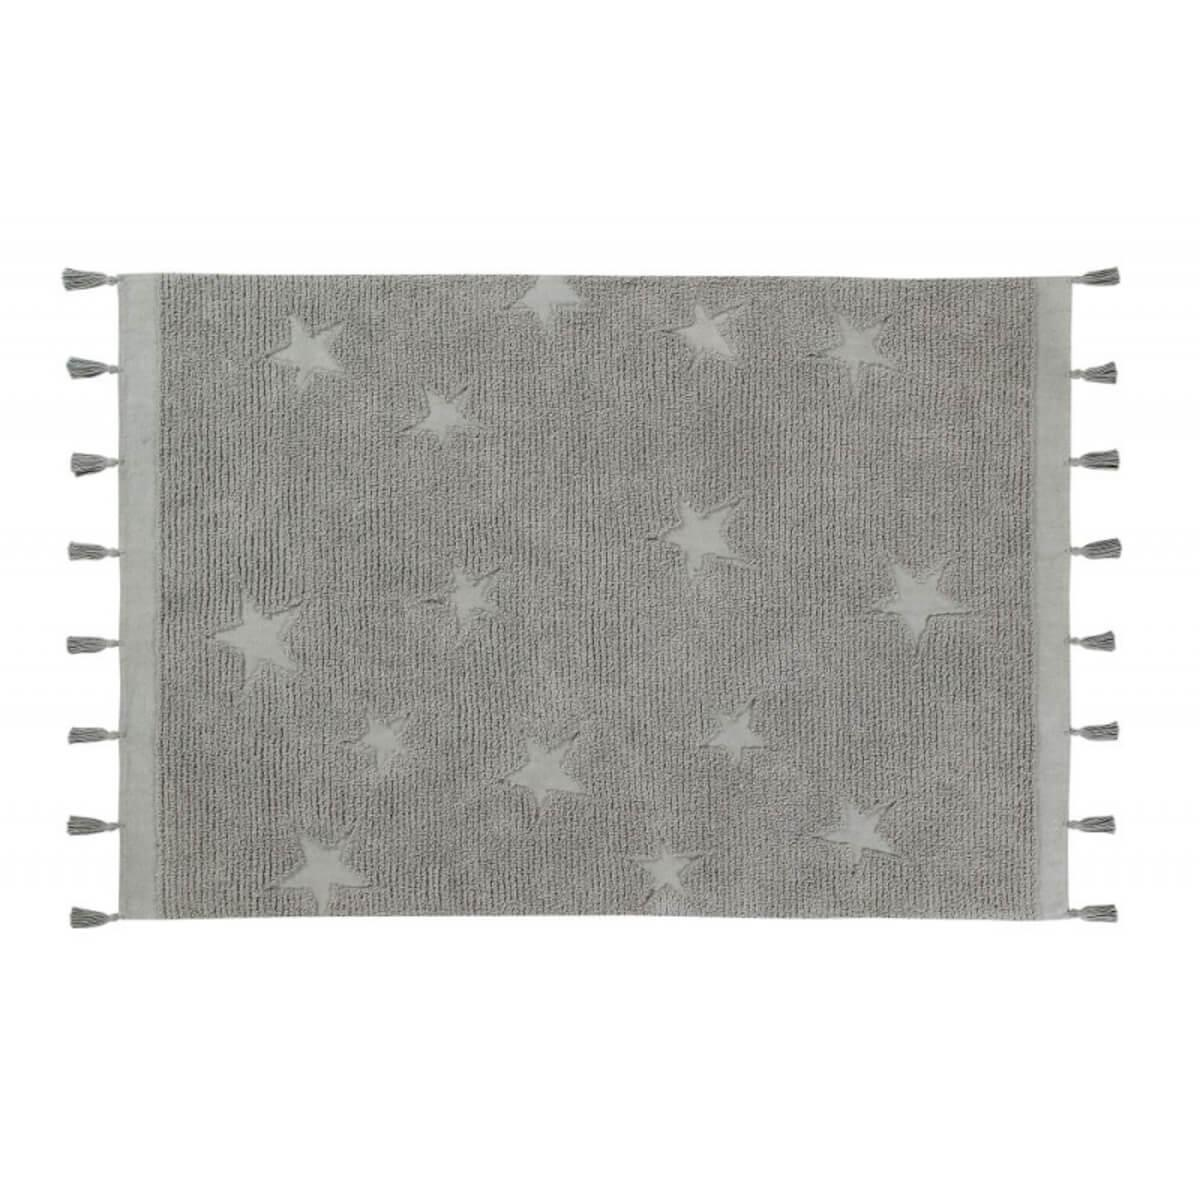 Tapis 120X175cm HIPPY STARS Lorena Canals grey